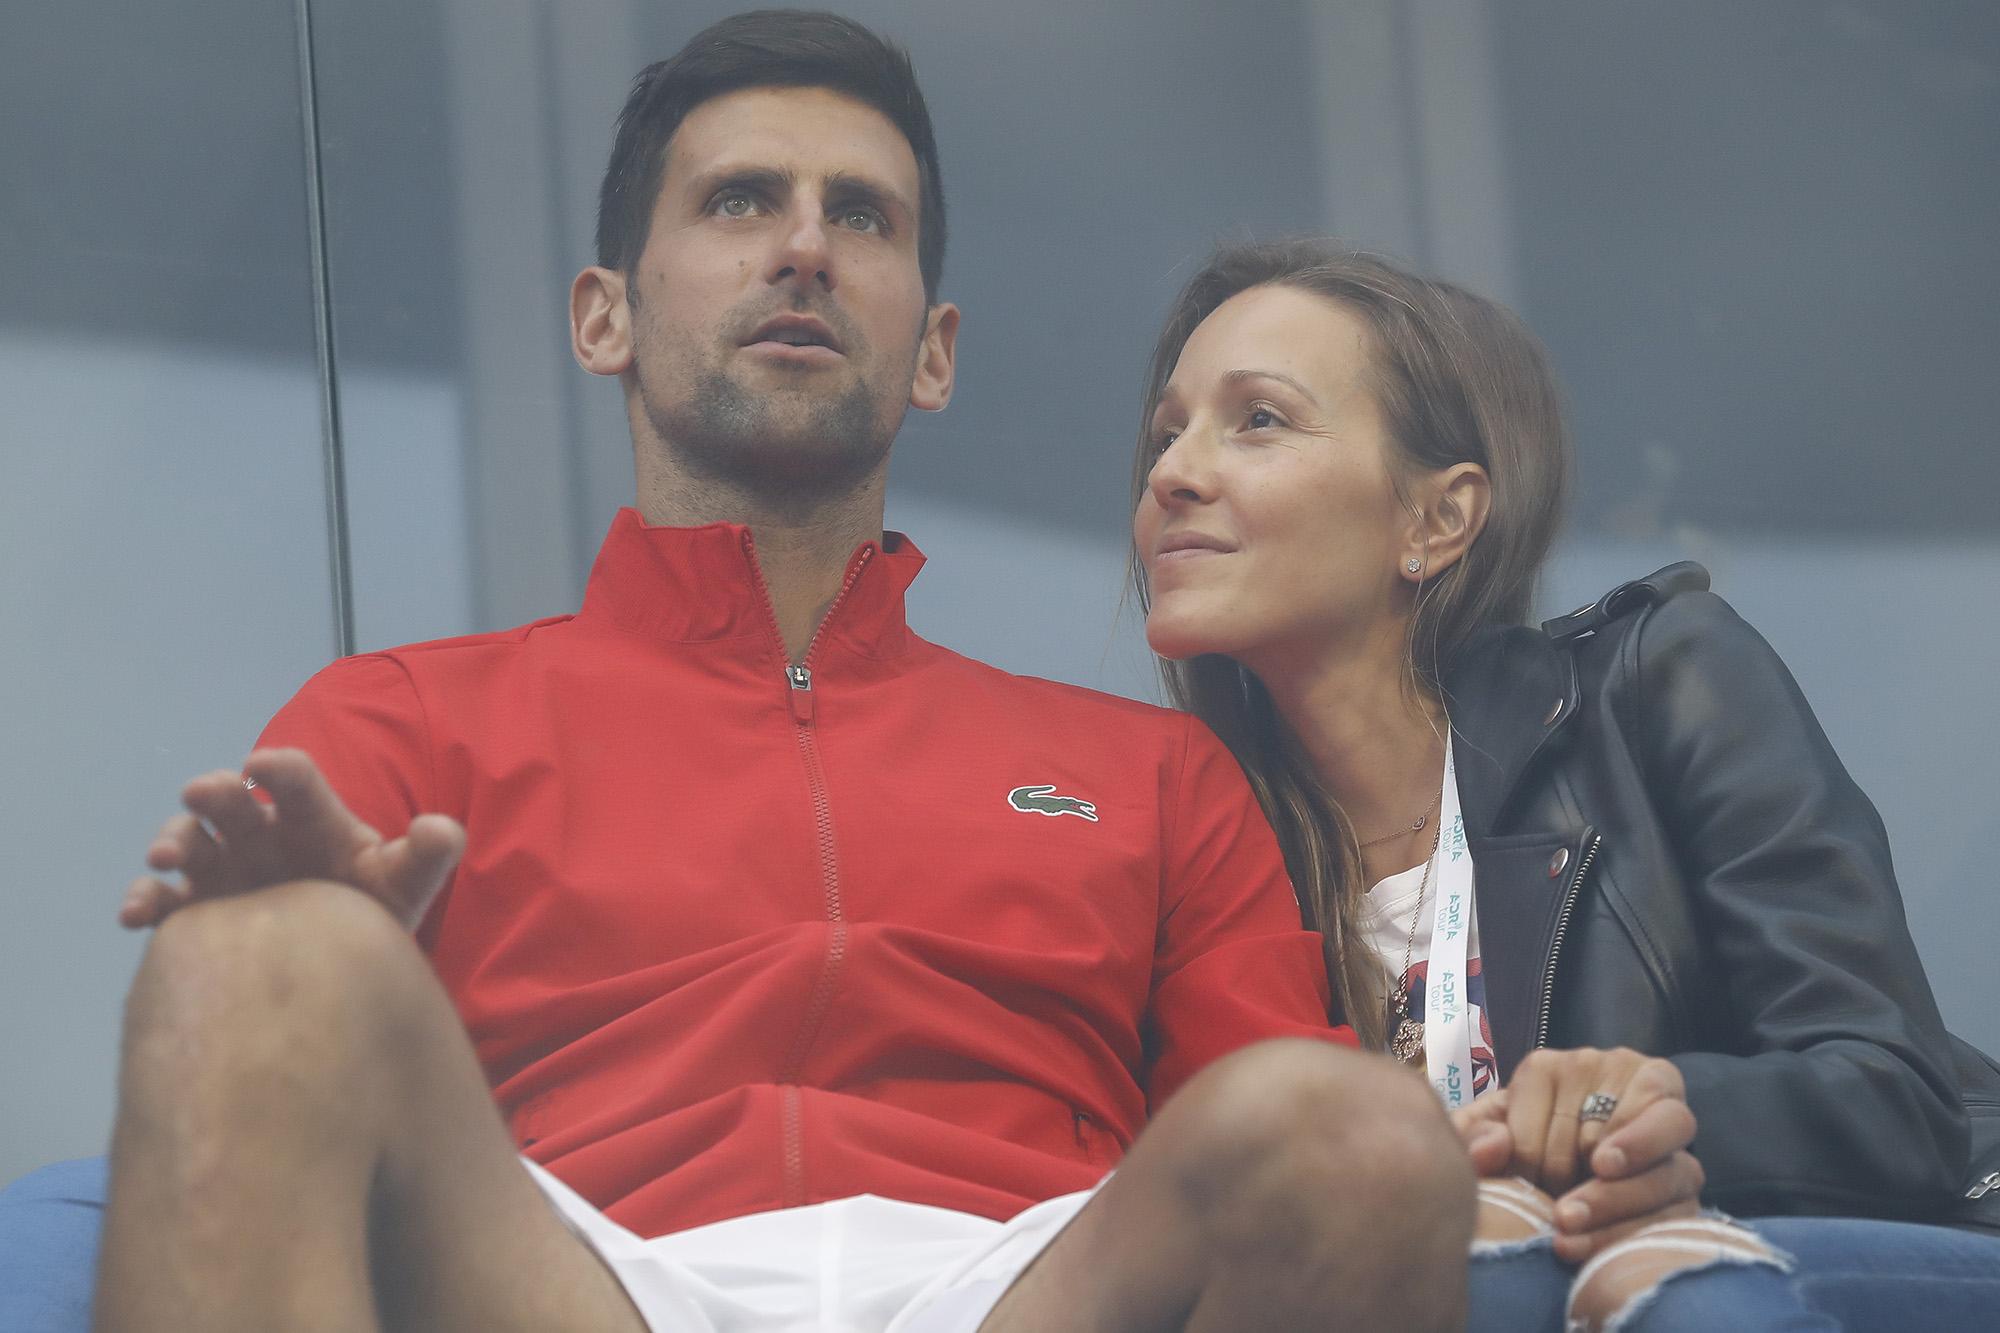 Novak Djokovic Wife Jelena Cleared Of Coronavirus After Adria Tour Fiasco